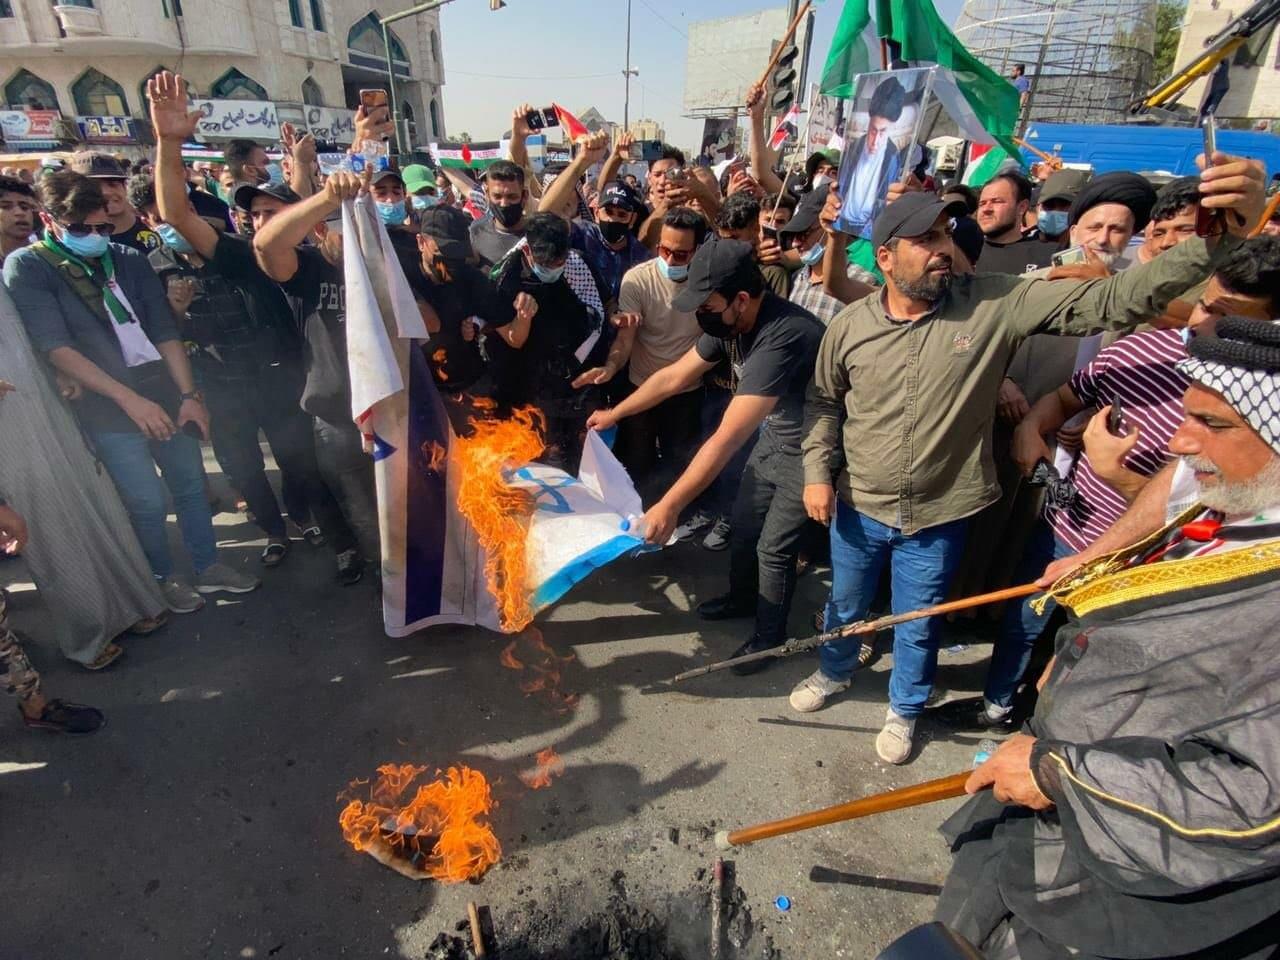 عراقيون يحرقون علم اسرائيل نصرة لفلسطين